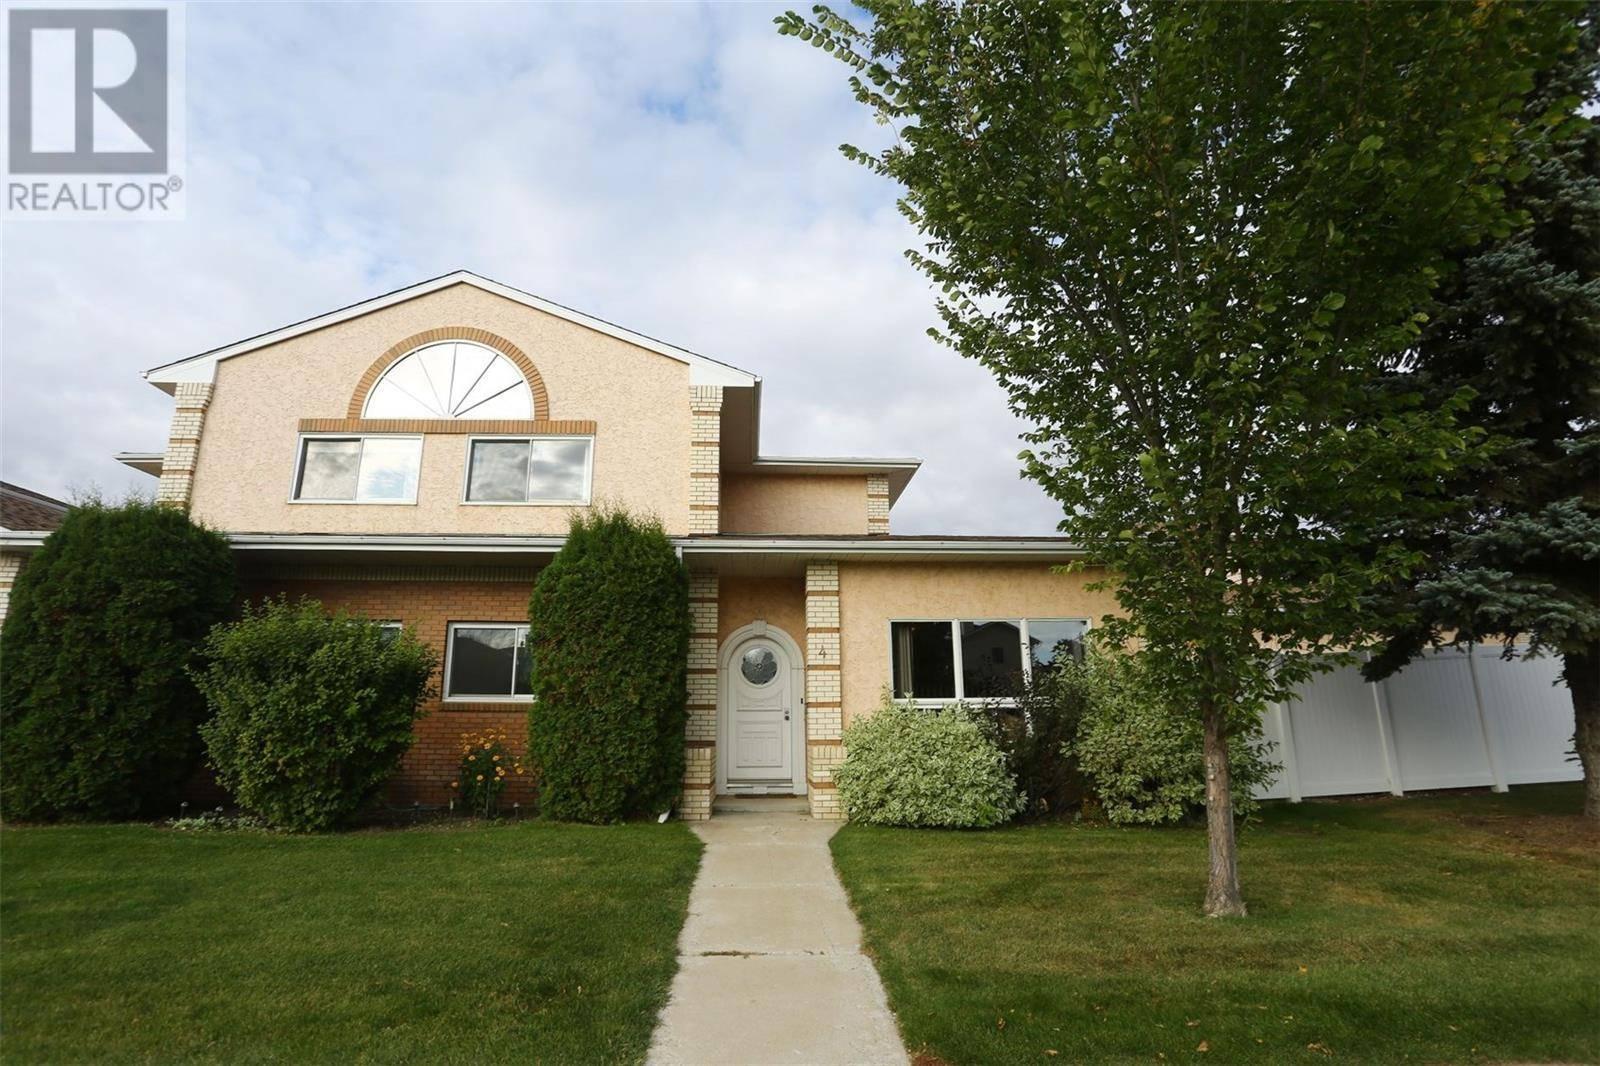 Townhouse for sale at 107 Rever Rd Unit 4 Saskatoon Saskatchewan - MLS: SK790114